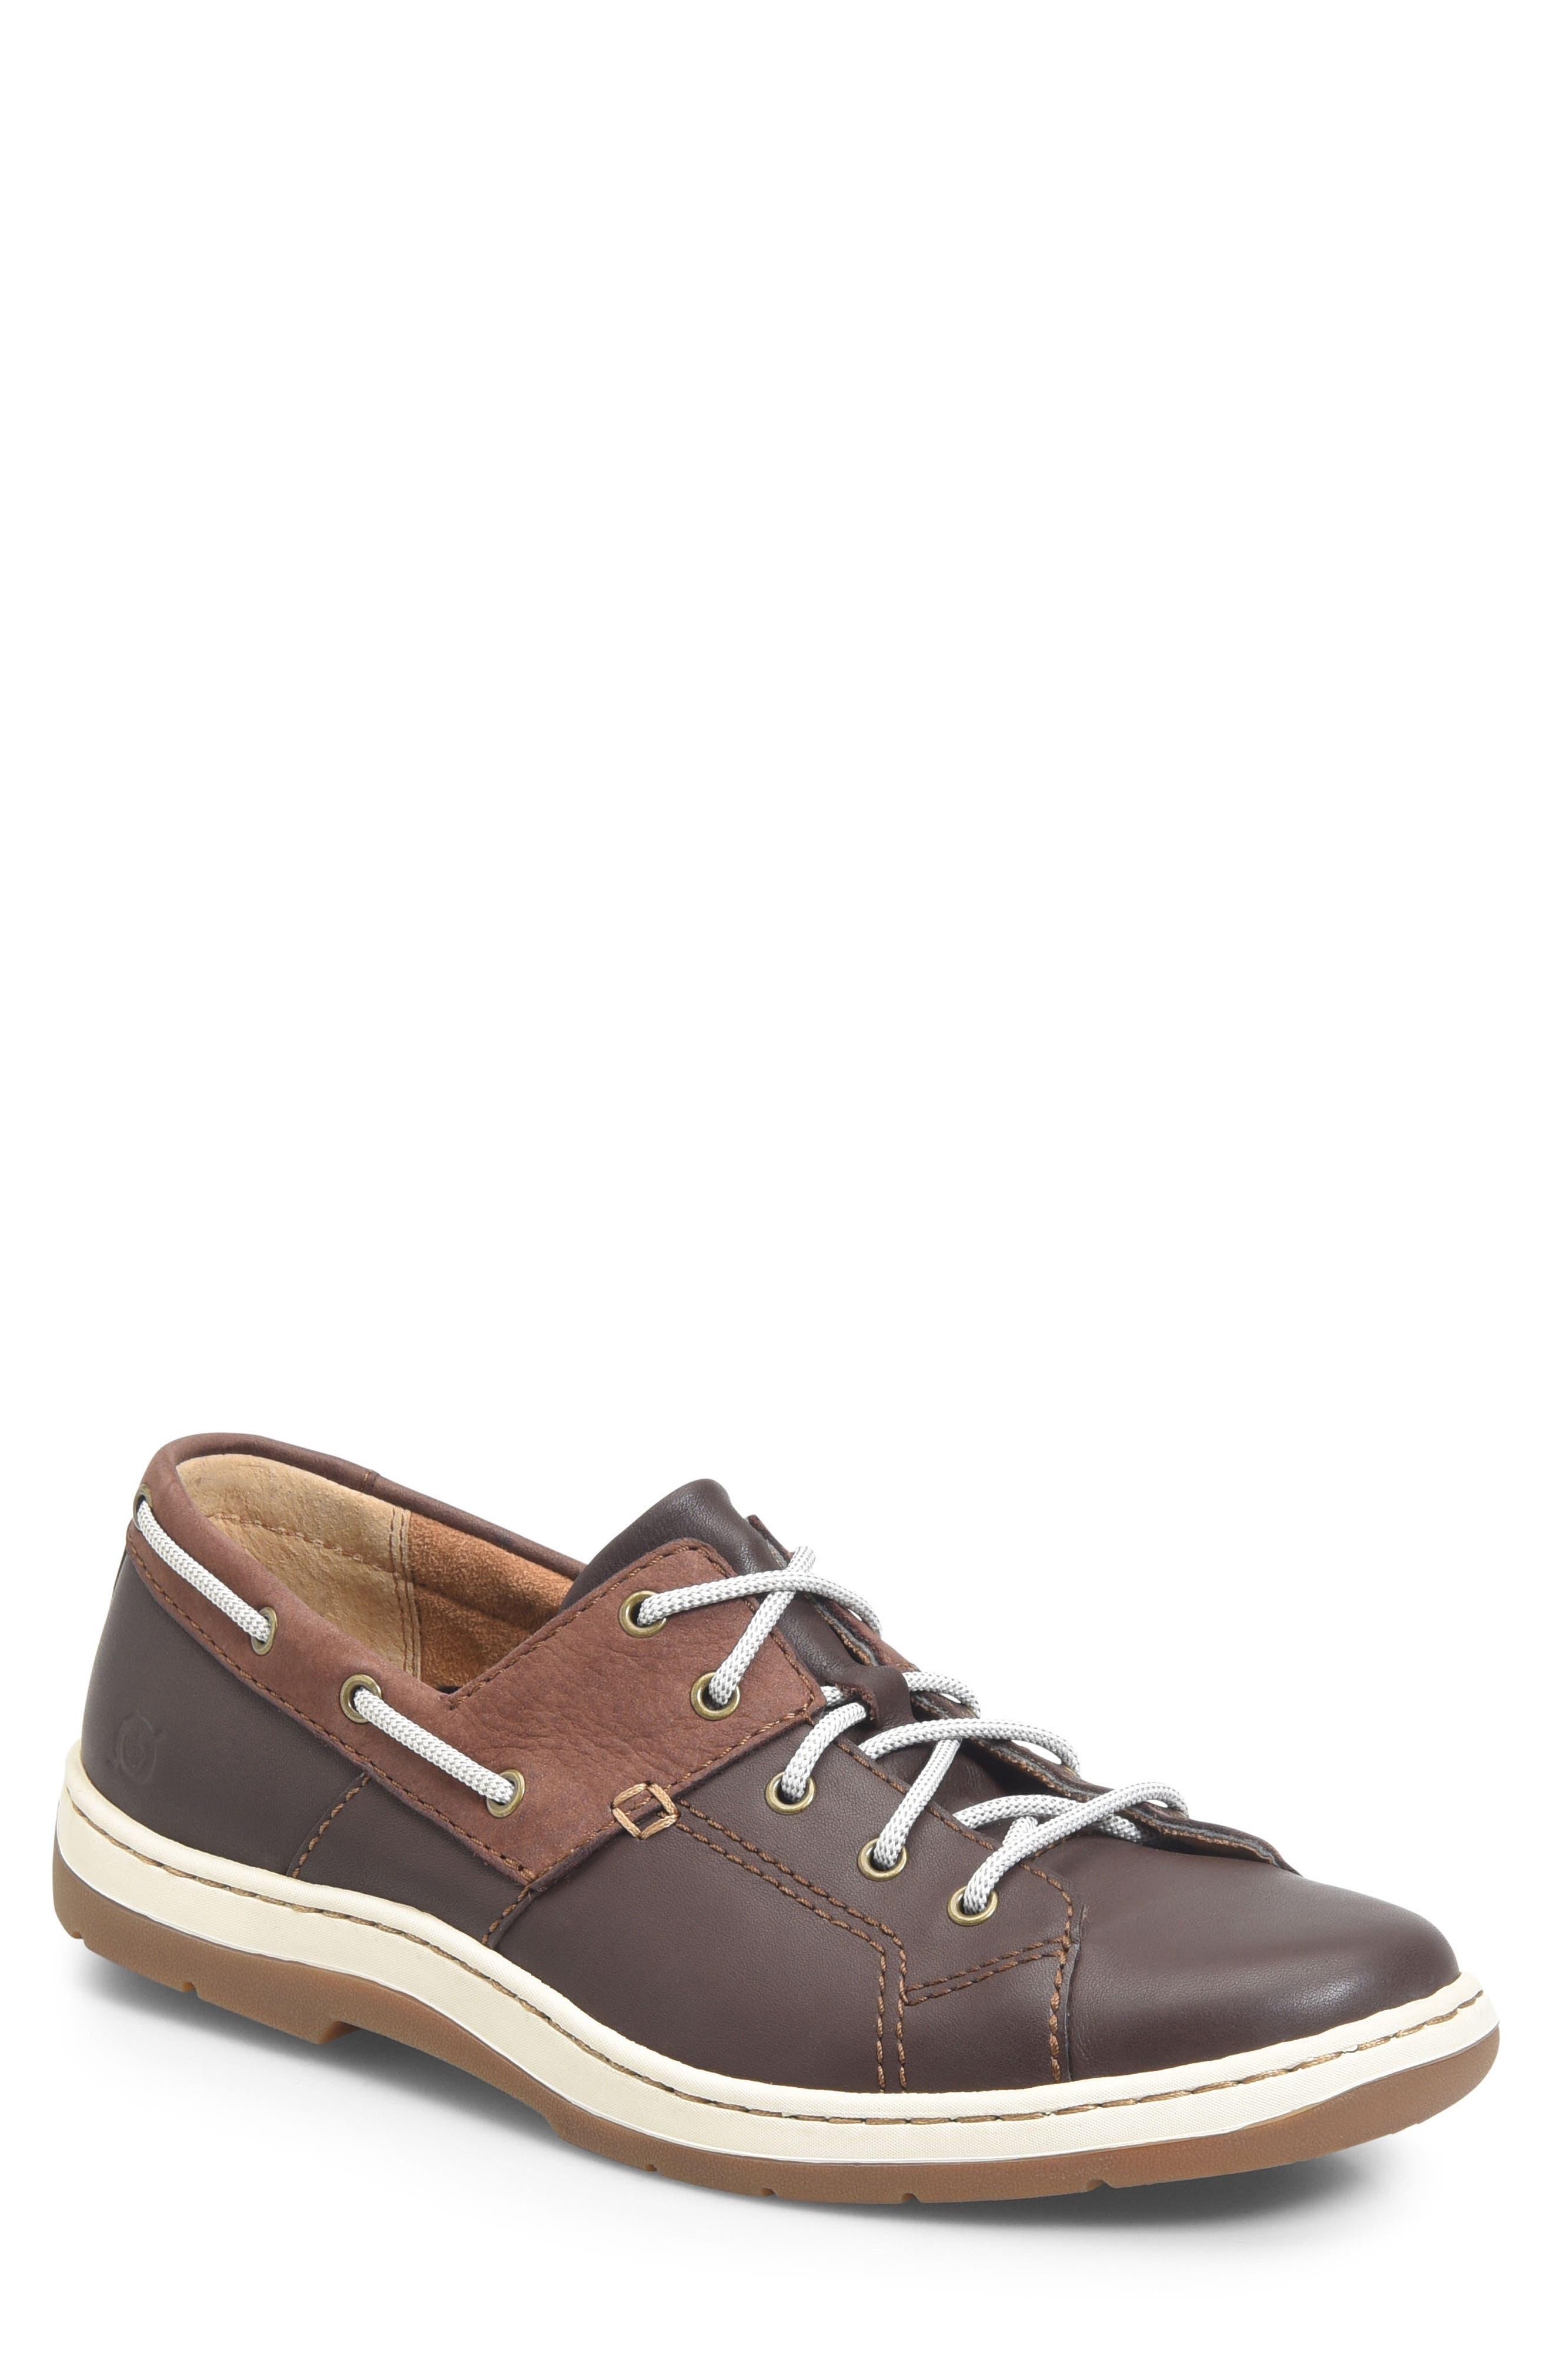 Marius Boat Shoe Sneaker,                             Main thumbnail 1, color,                             205